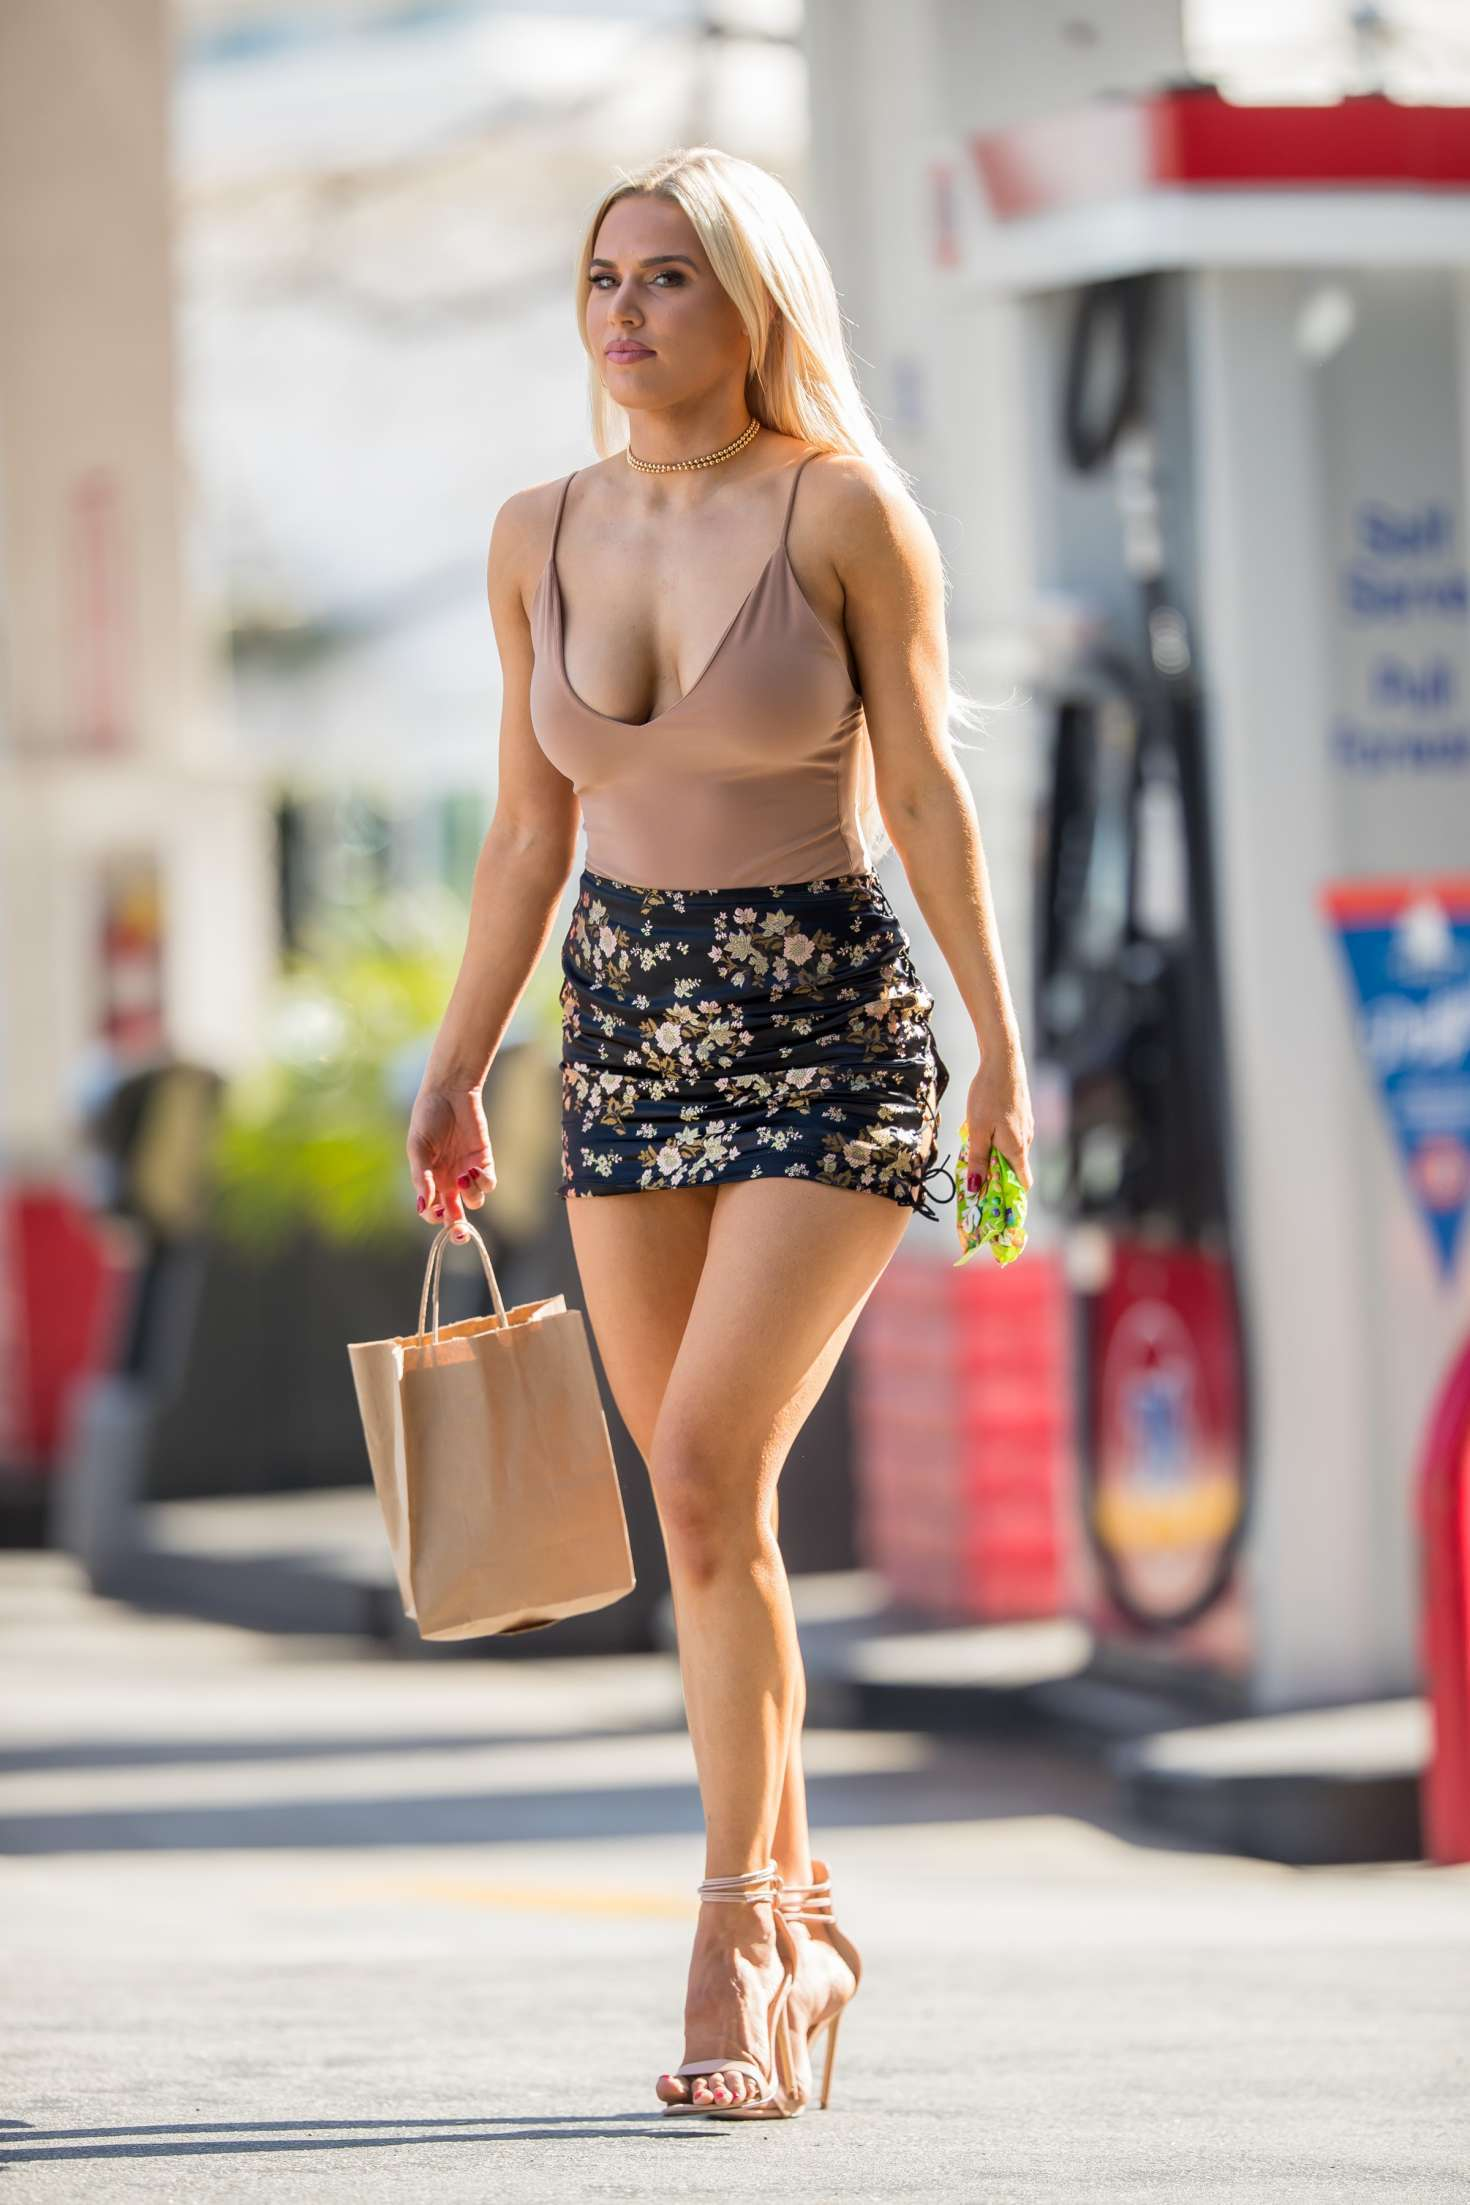 Lana nudes wwe 55 NUDE